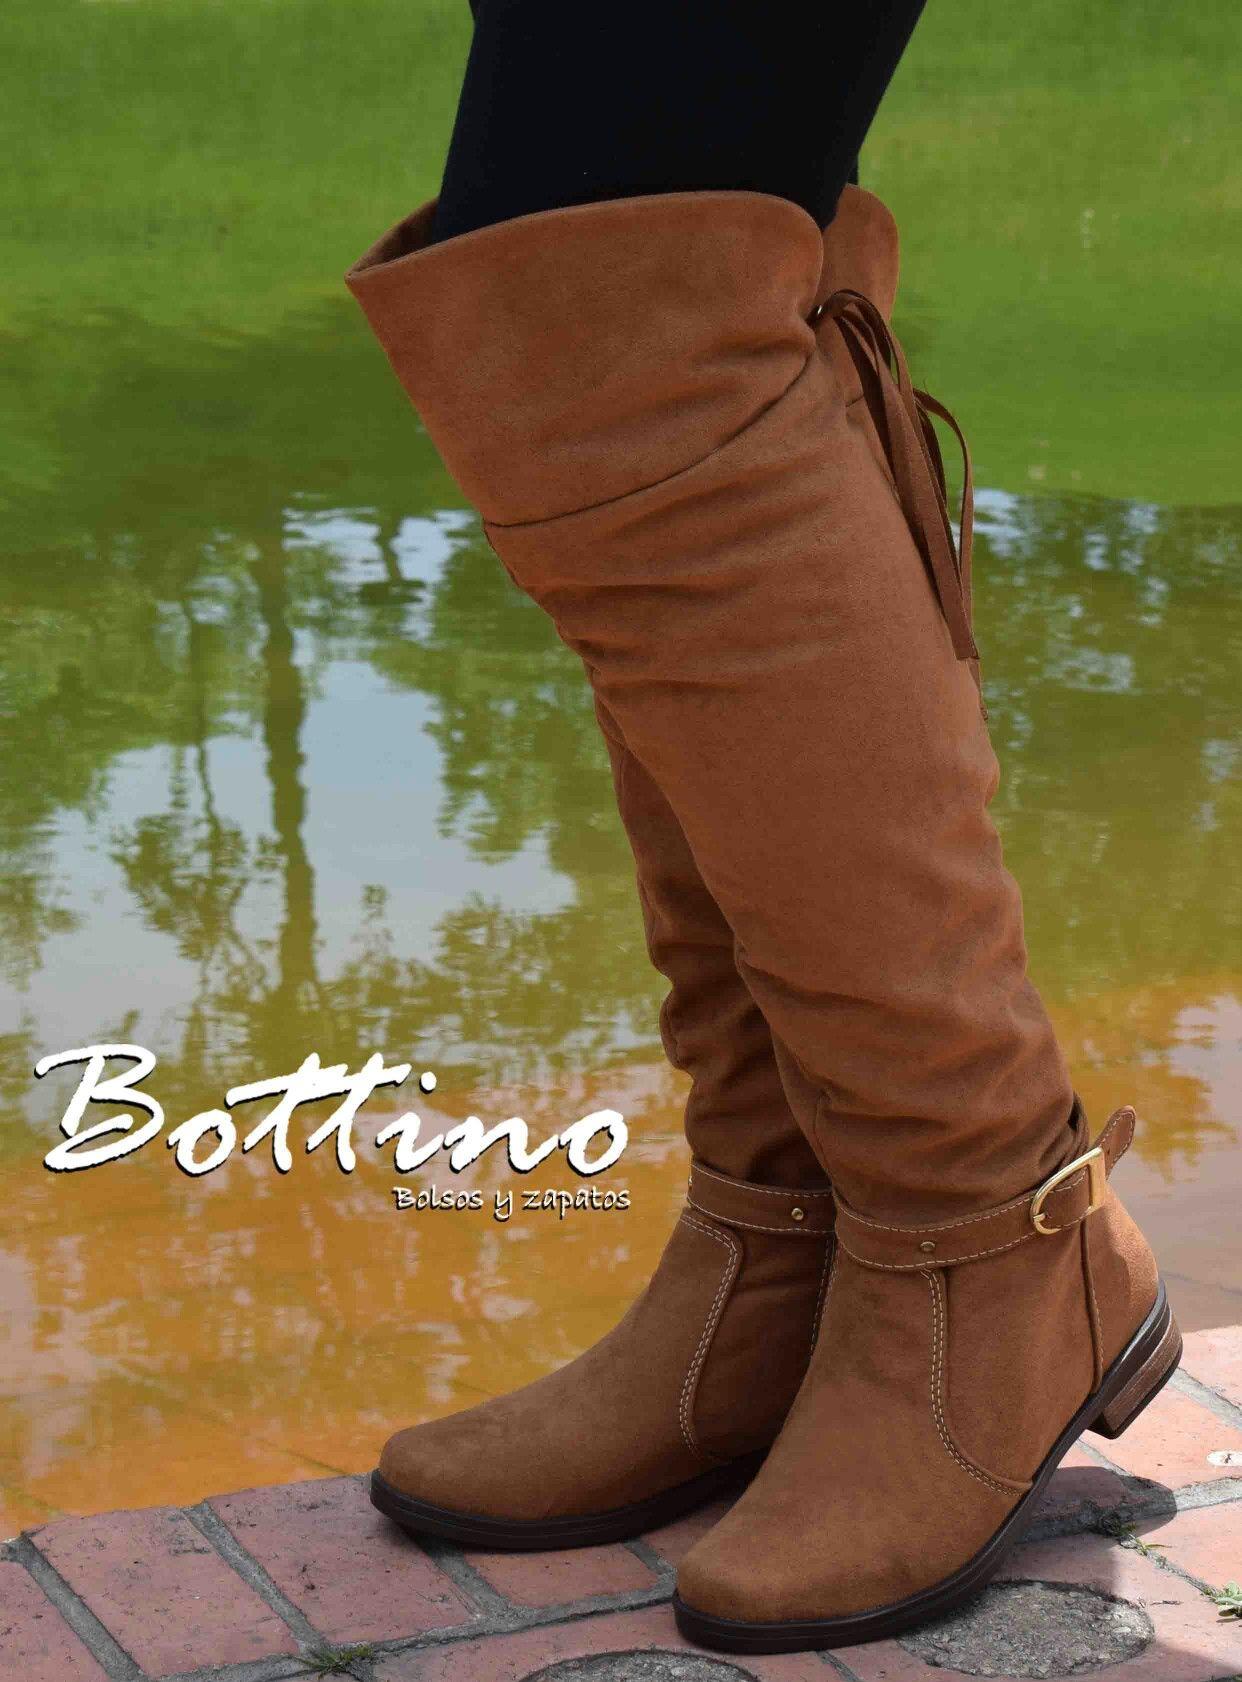 Botas extra largas www.bottino.com.co botas  botas  mujer  líneafemenina   zapatos  compracolombiano  YoUsoBottino  Colombia d26c58d74e0